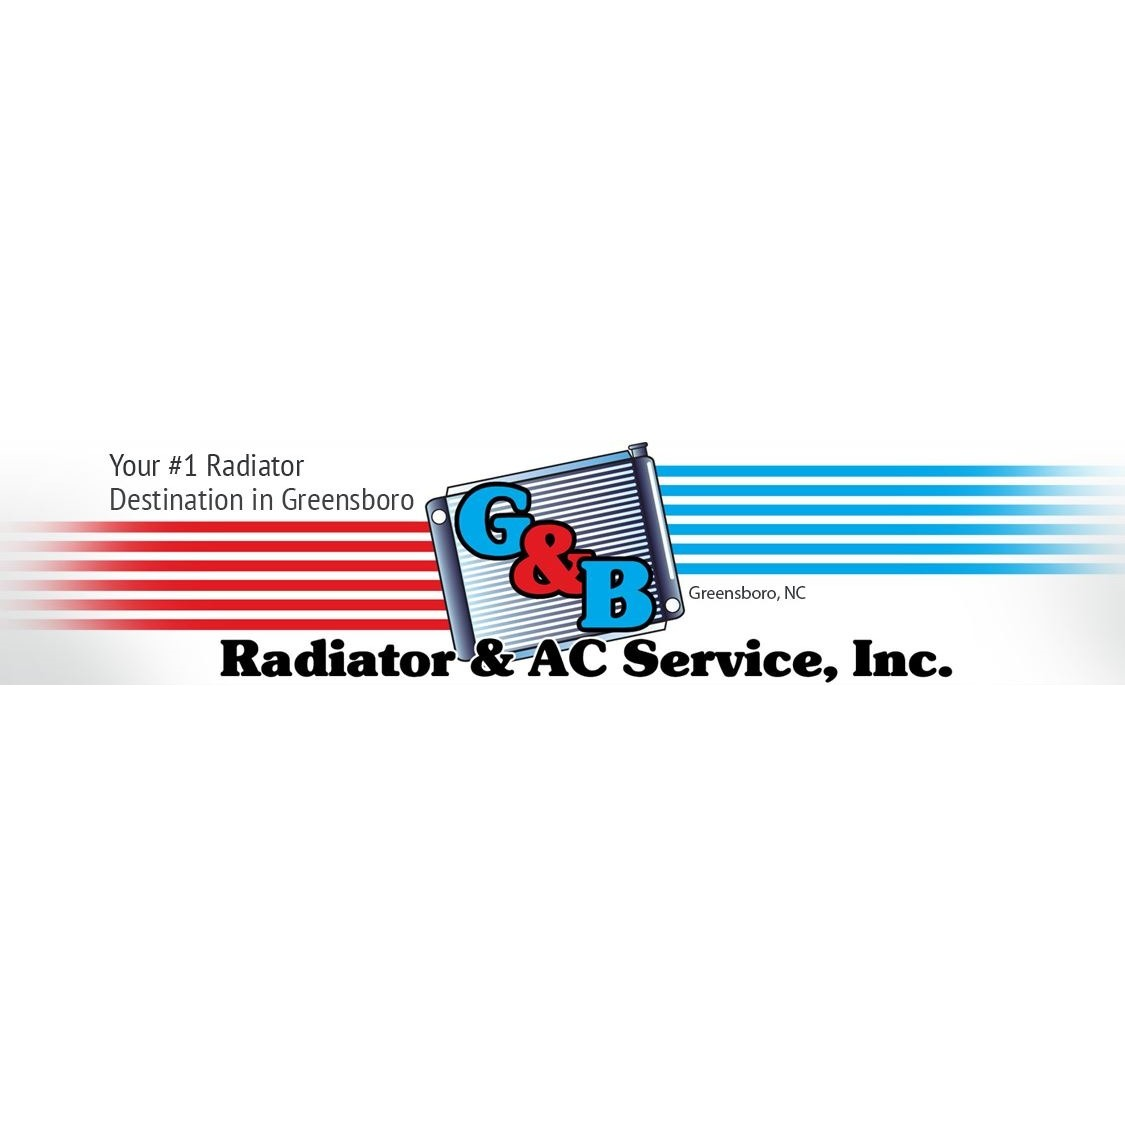 G & B Radiator & Ac Services, Inc.